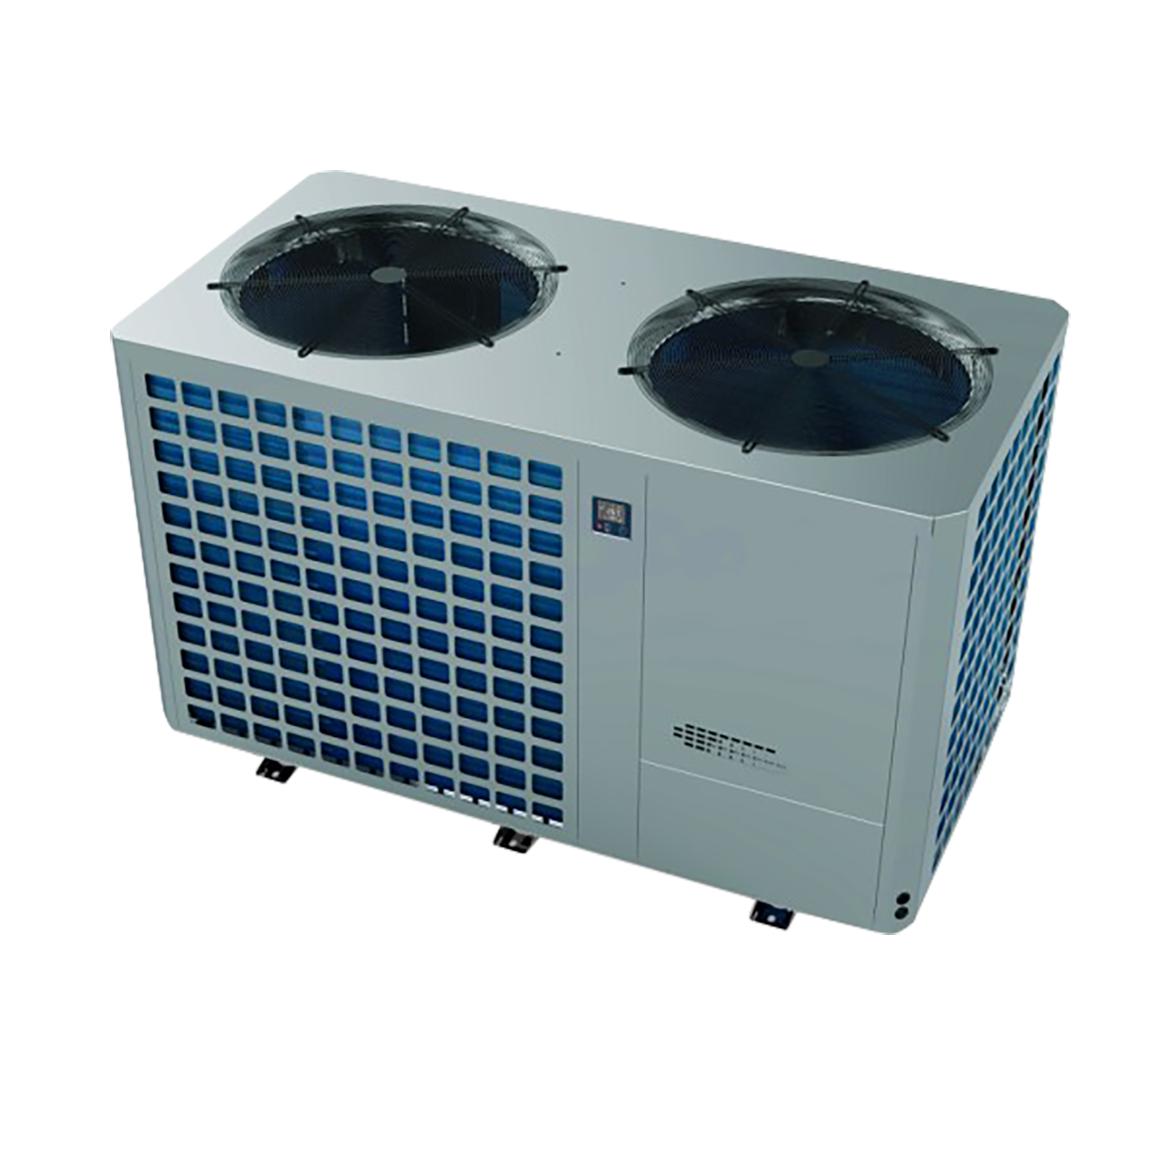 Smart Inverter Plus Wärmepumpe H+C 60,0kW 3Ph., Kältemittel R410A Smart Inverter Plus Wärmepumpe H+C 60,0kW 3Ph., Kältemittel R410A